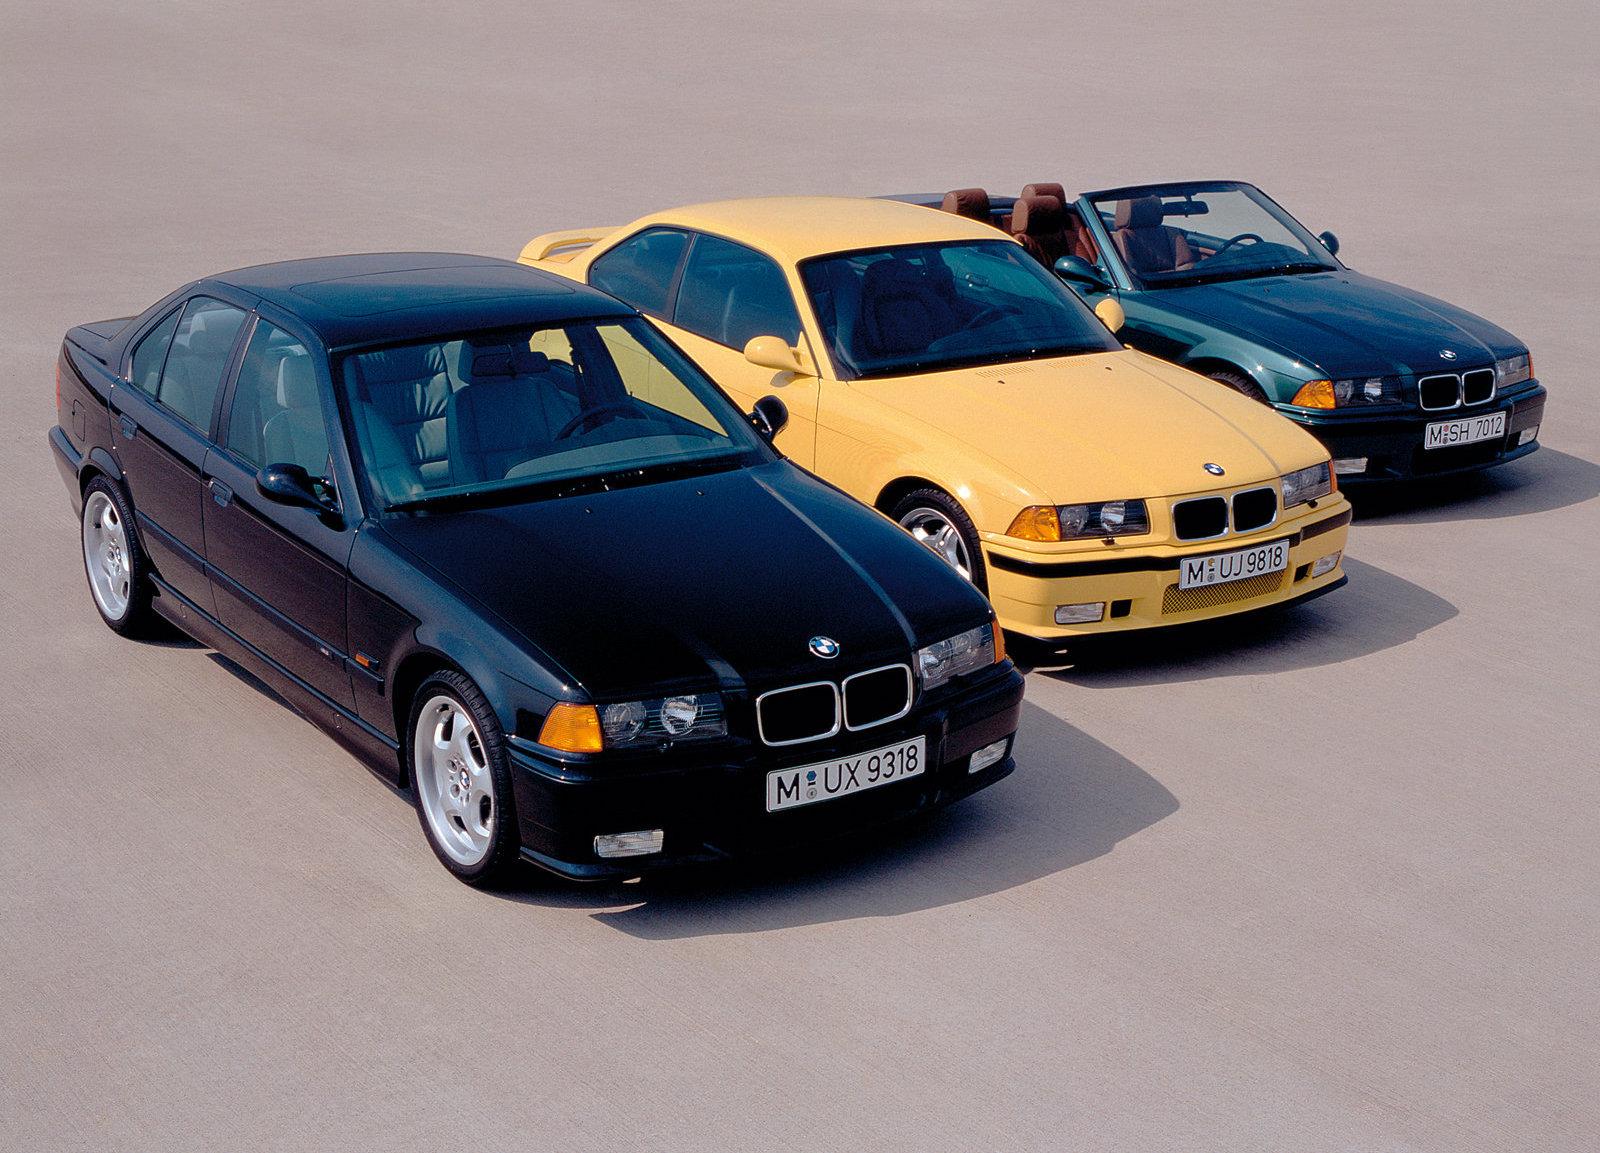 1995 BMW M3 lineup